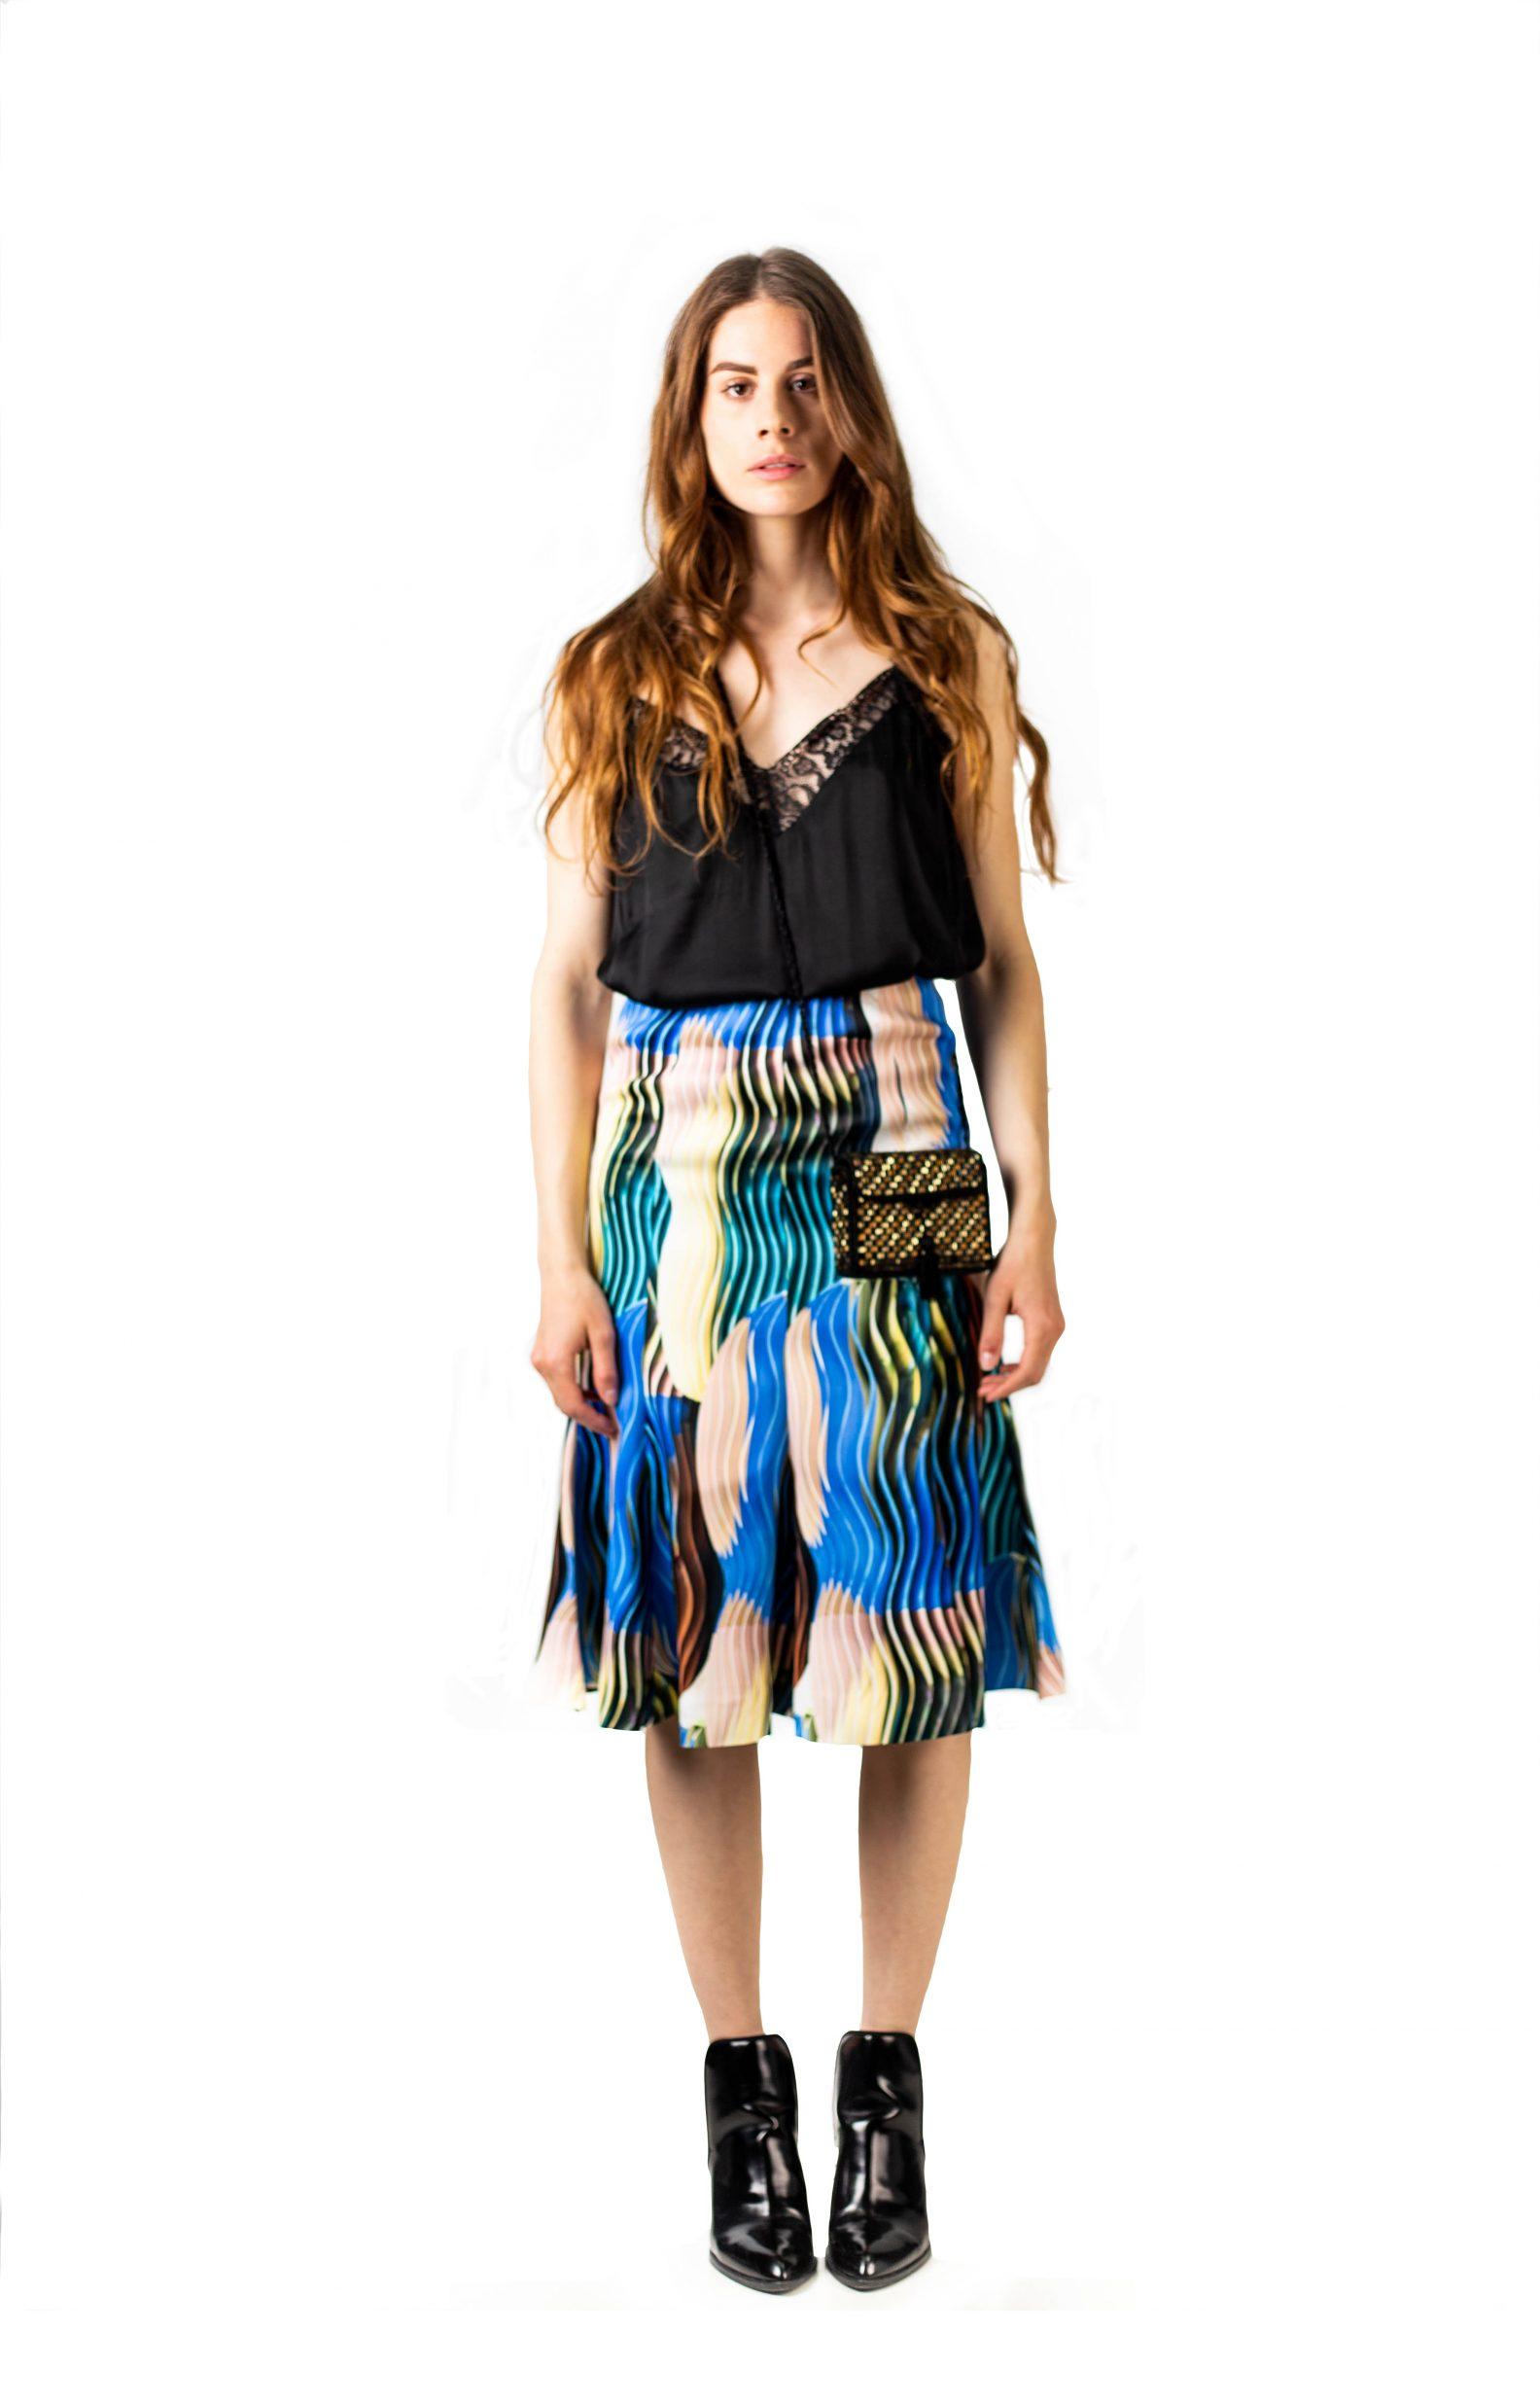 2-jupe-midi-affaires-etrangeres-paris-mode-ethnique-coreenne-vleeda